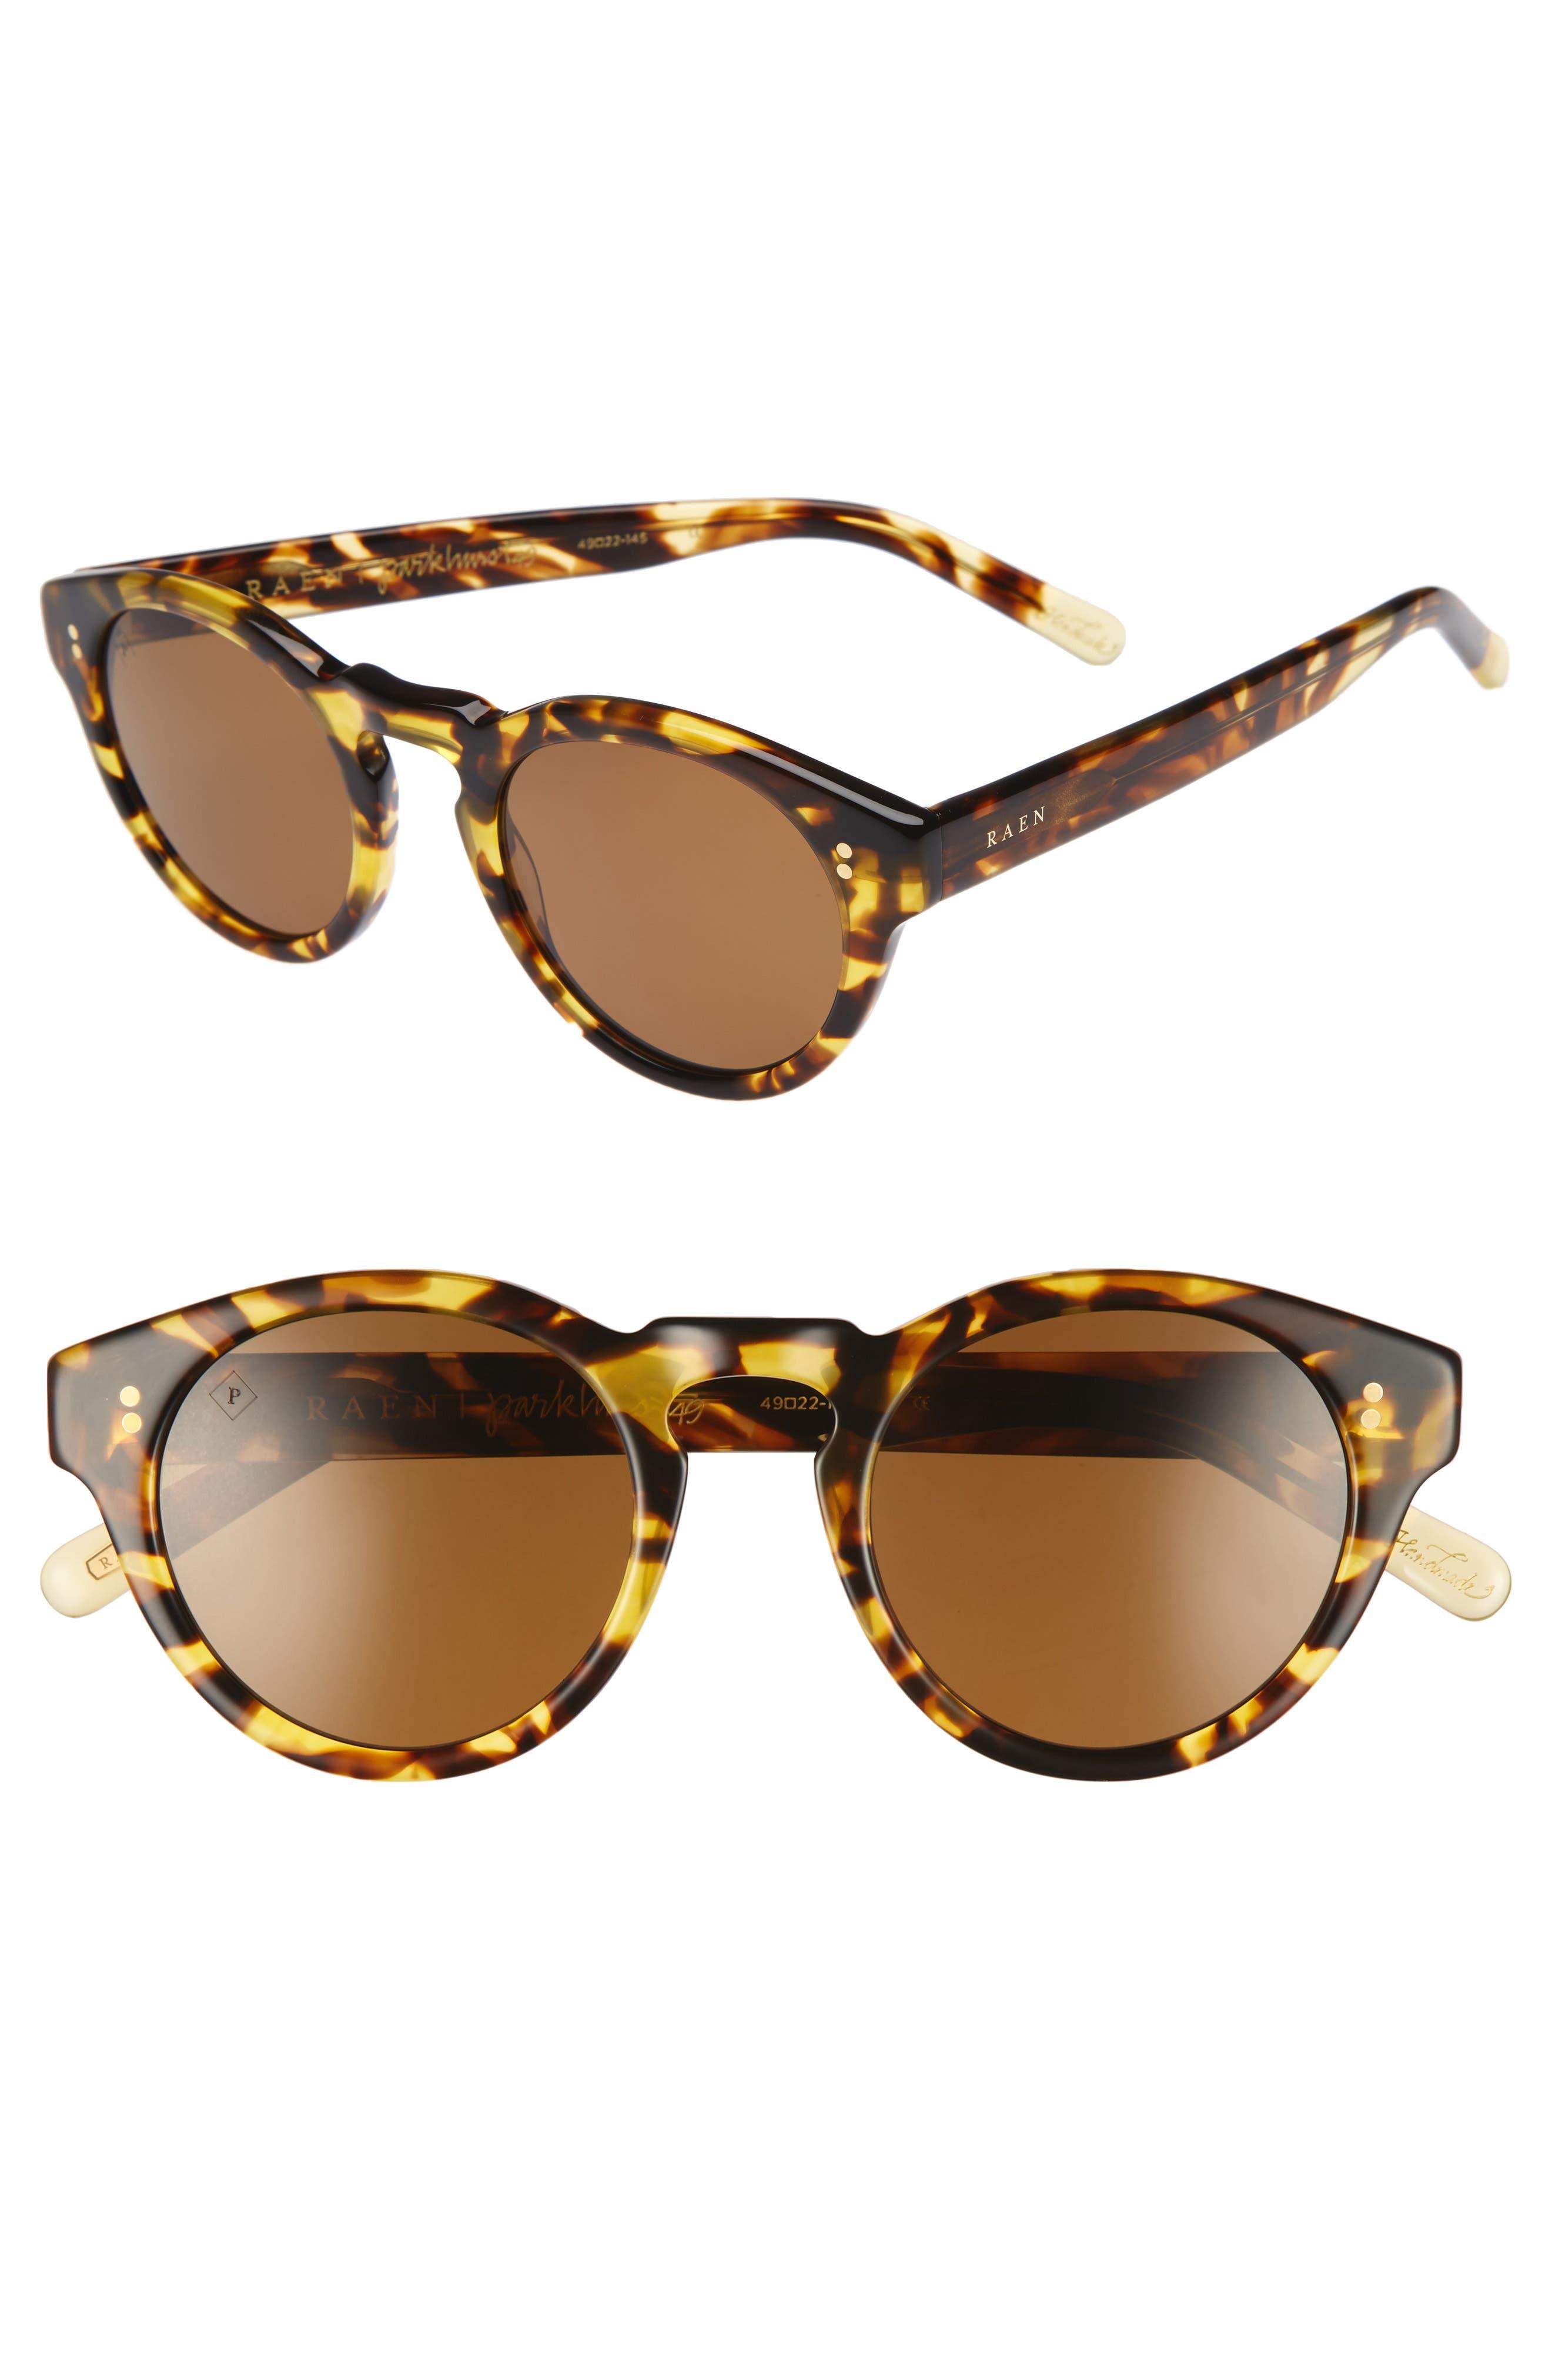 Parkhurst 49mm Sunglasses,                             Main thumbnail 1, color,                             Tokyo Tortoise/ Brown